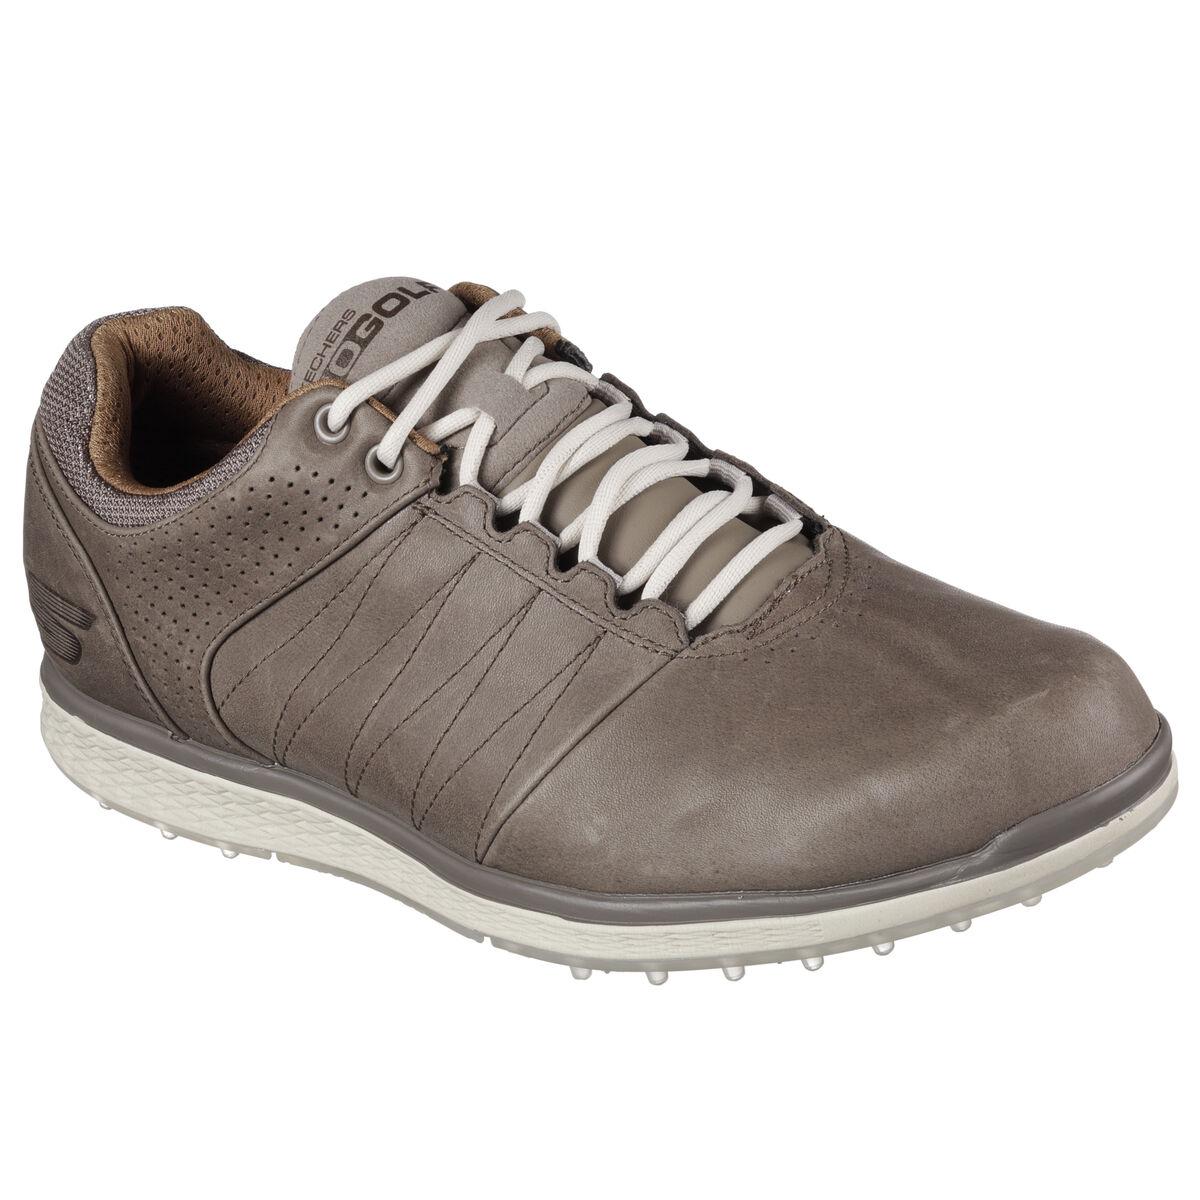 132895f42b13 Skechers GO GOLF Elite 2 LX Men s Golf Shoe - Stone